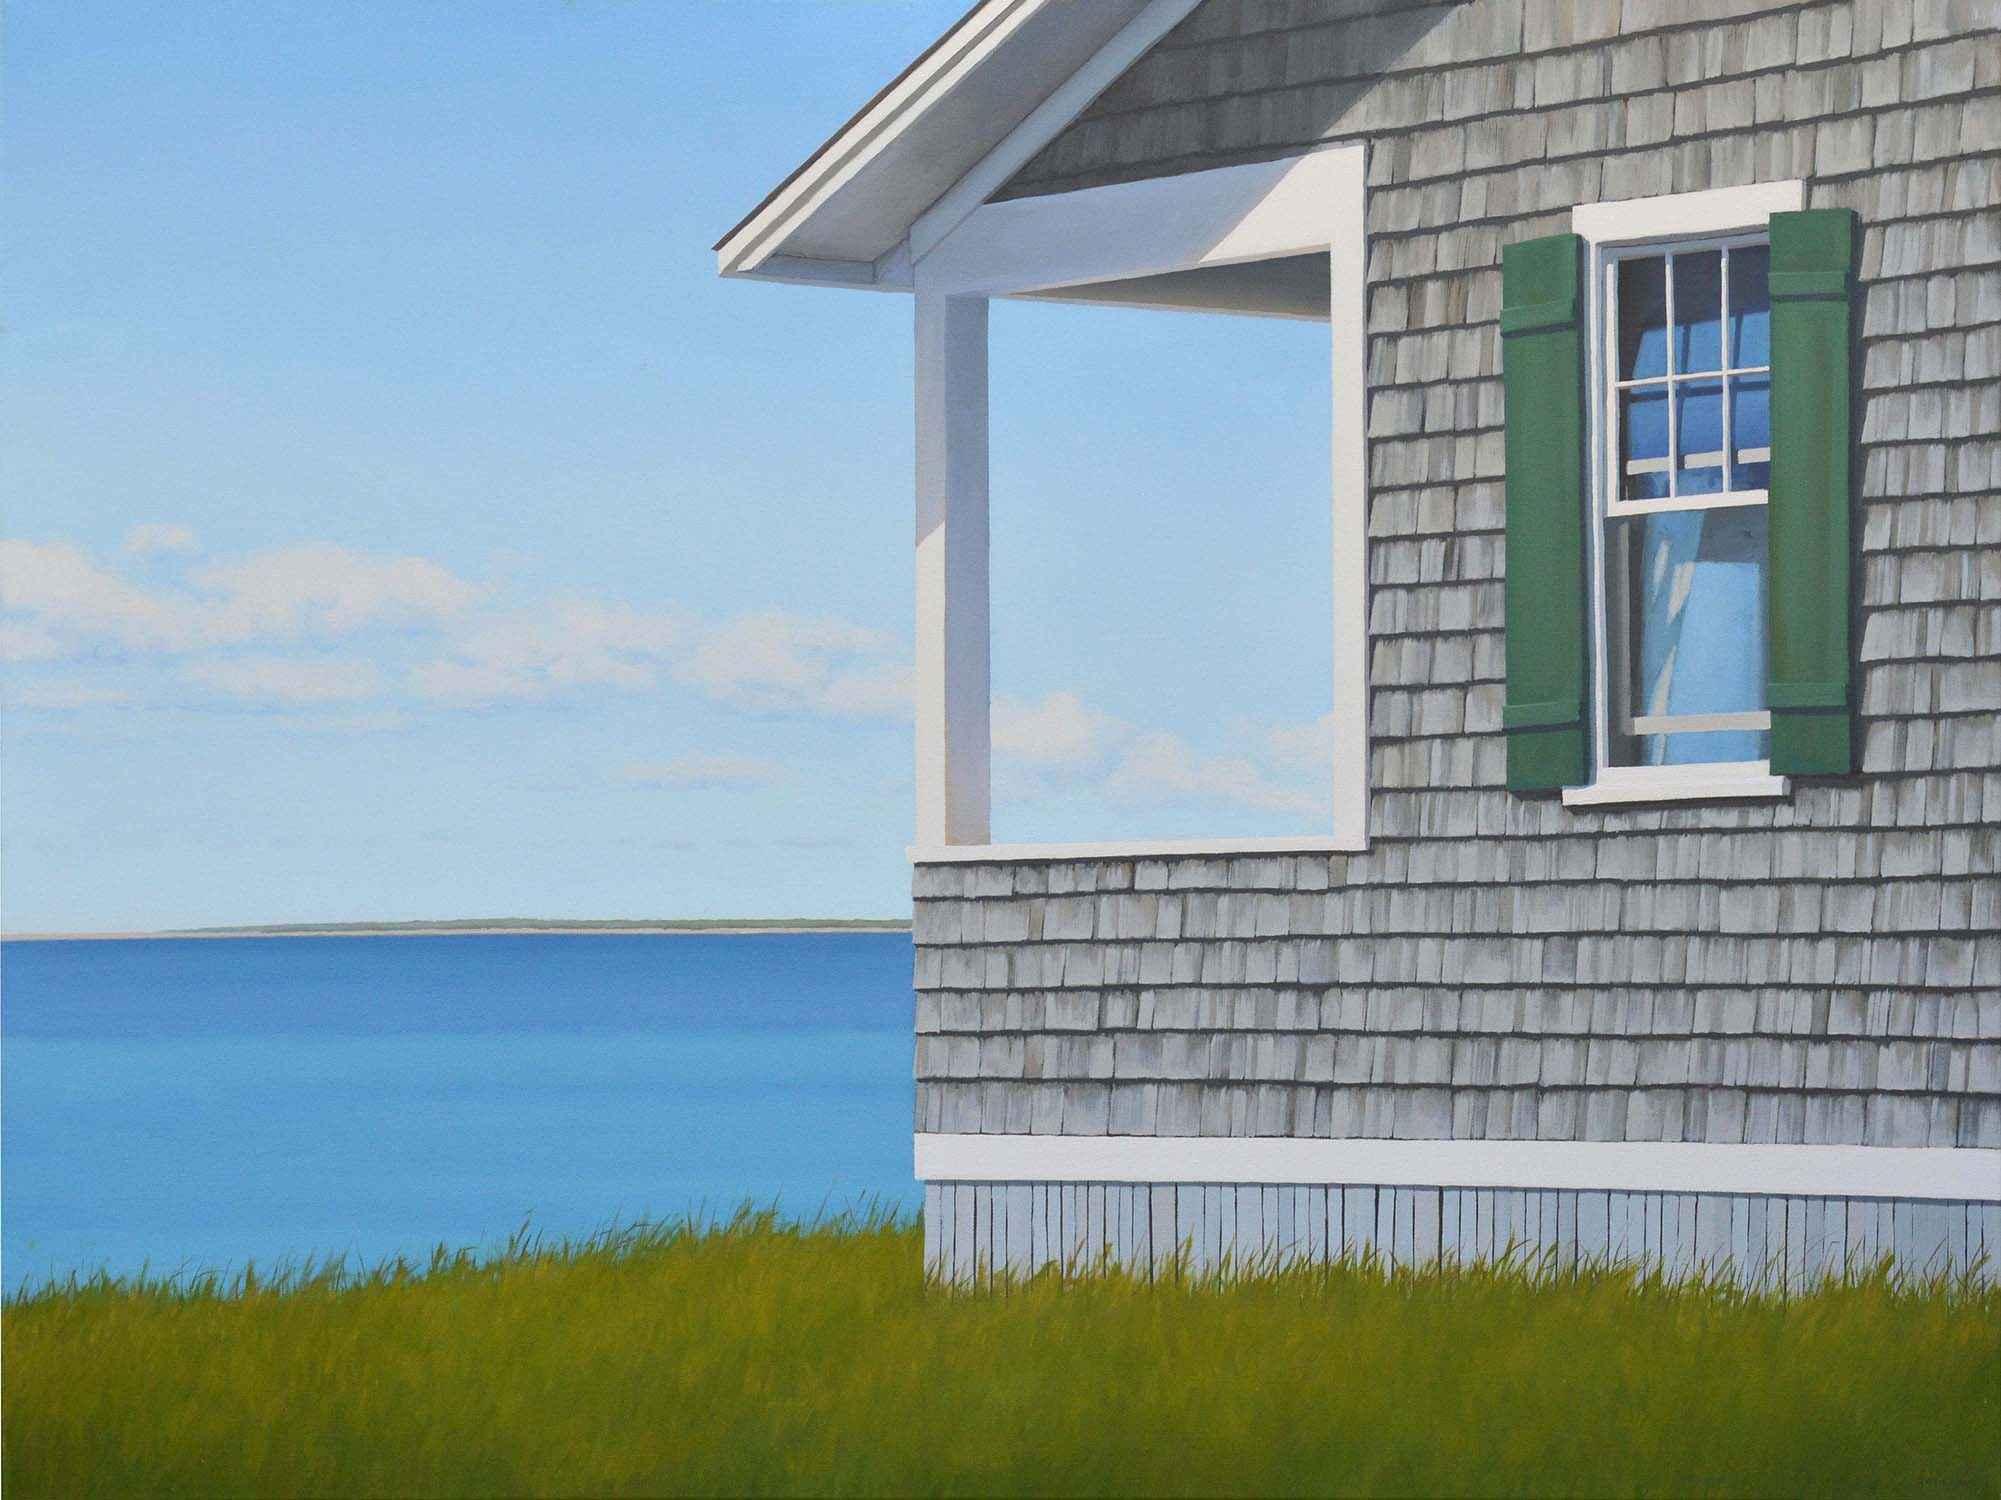 Summer Outlook by  Jim Holland - Masterpiece Online